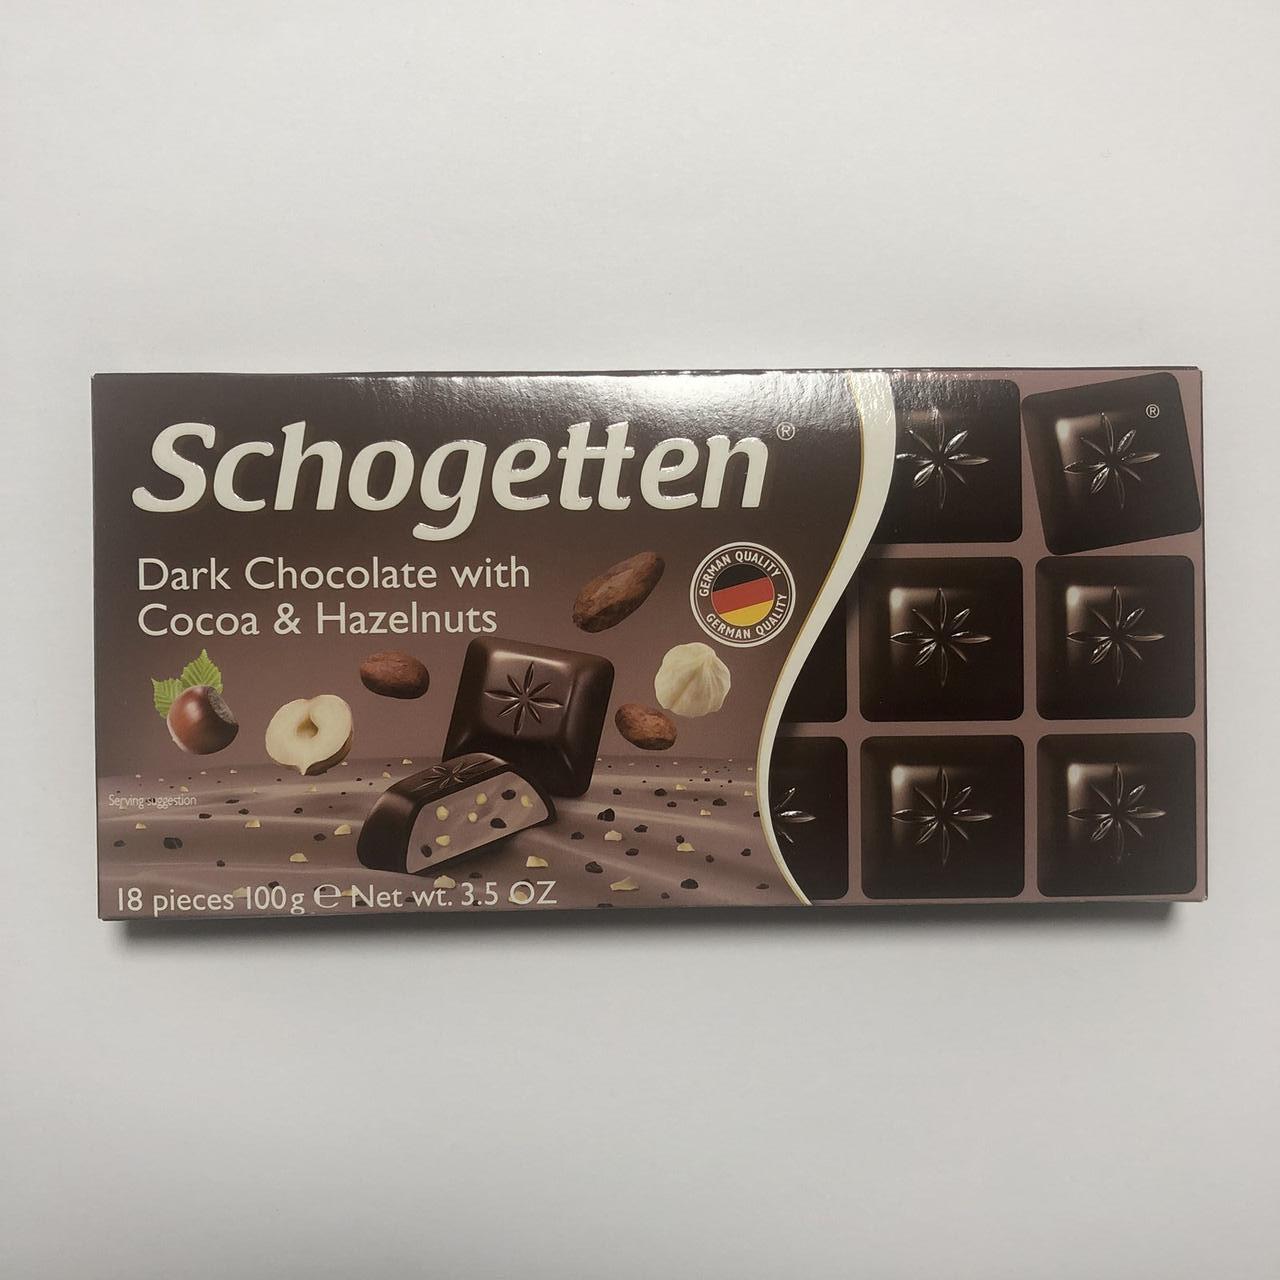 Шоколад темный «Schogetten» Dark Chocolate with Cocoa & Hazelnuts (фундук), 100 г.